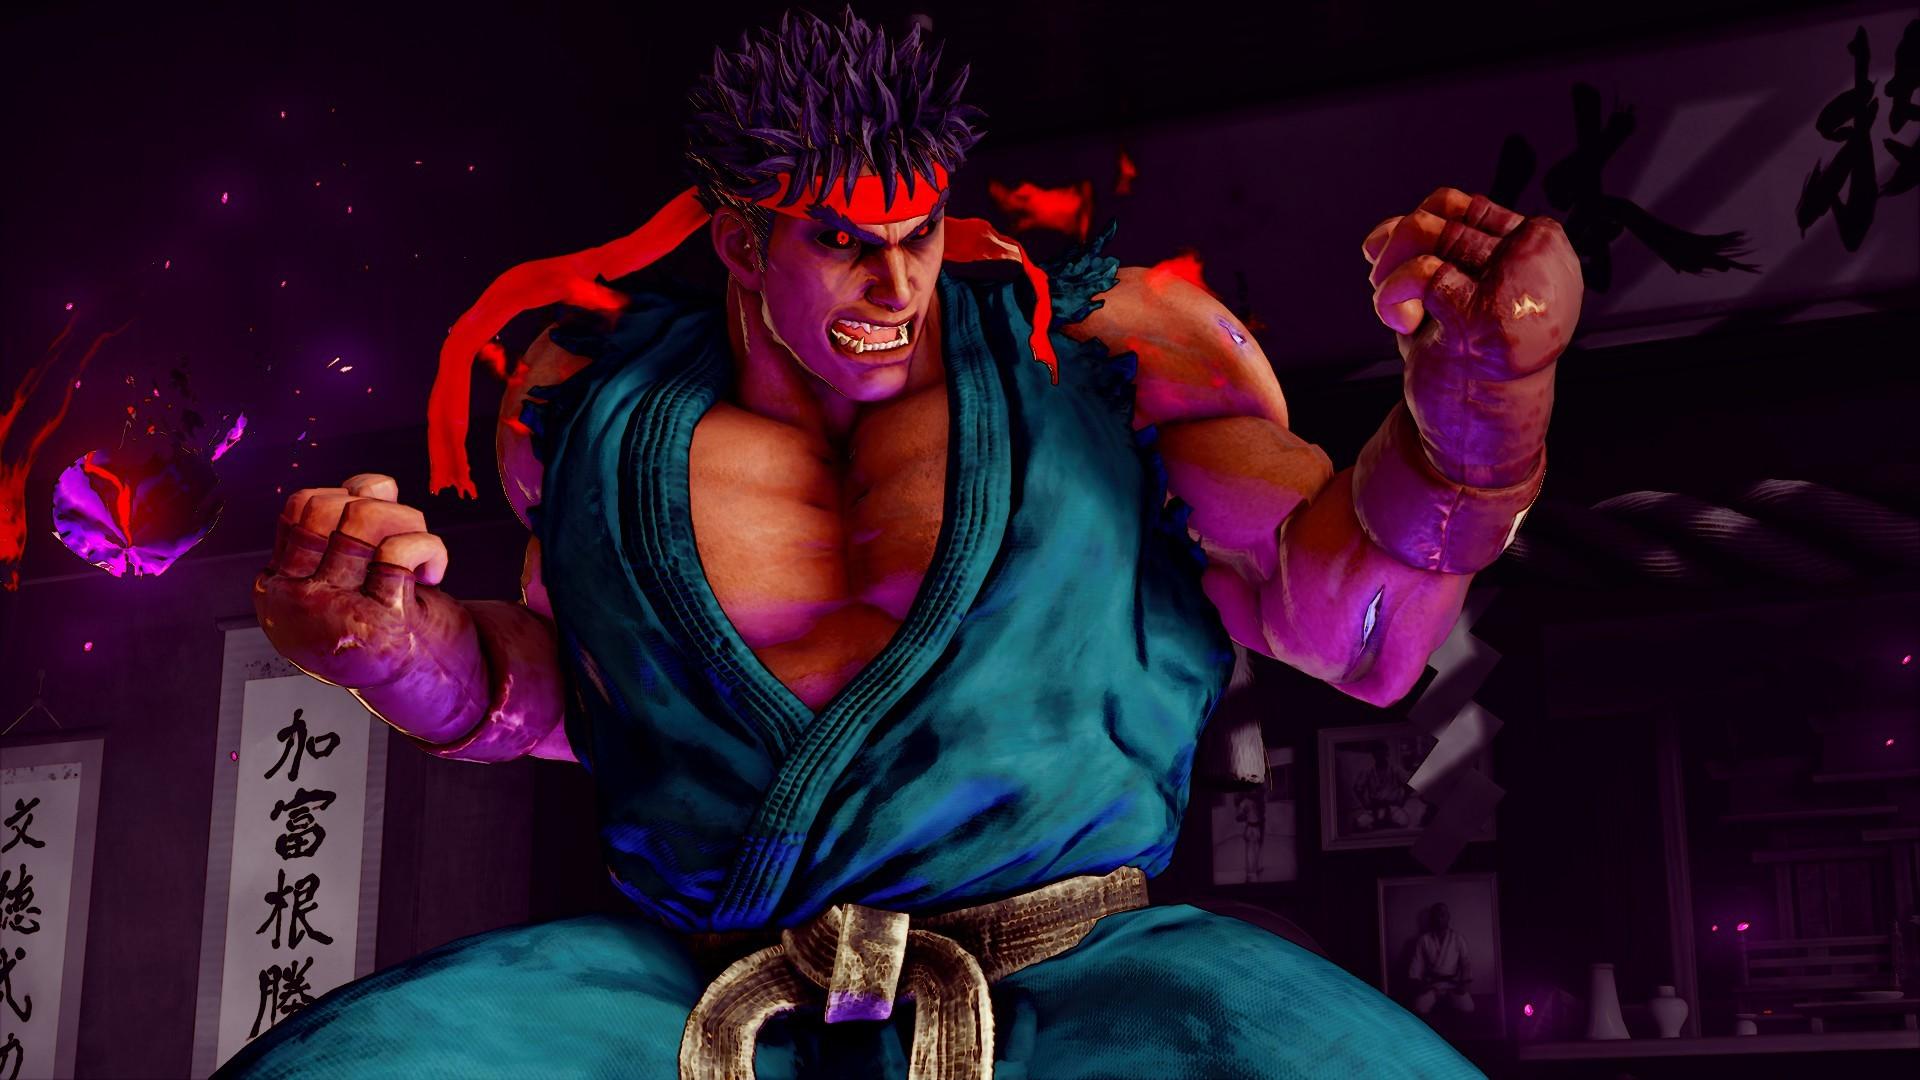 Res: 1920x1080, ... Kage (Evil Ryu) C1 Revised by SleepingMaster